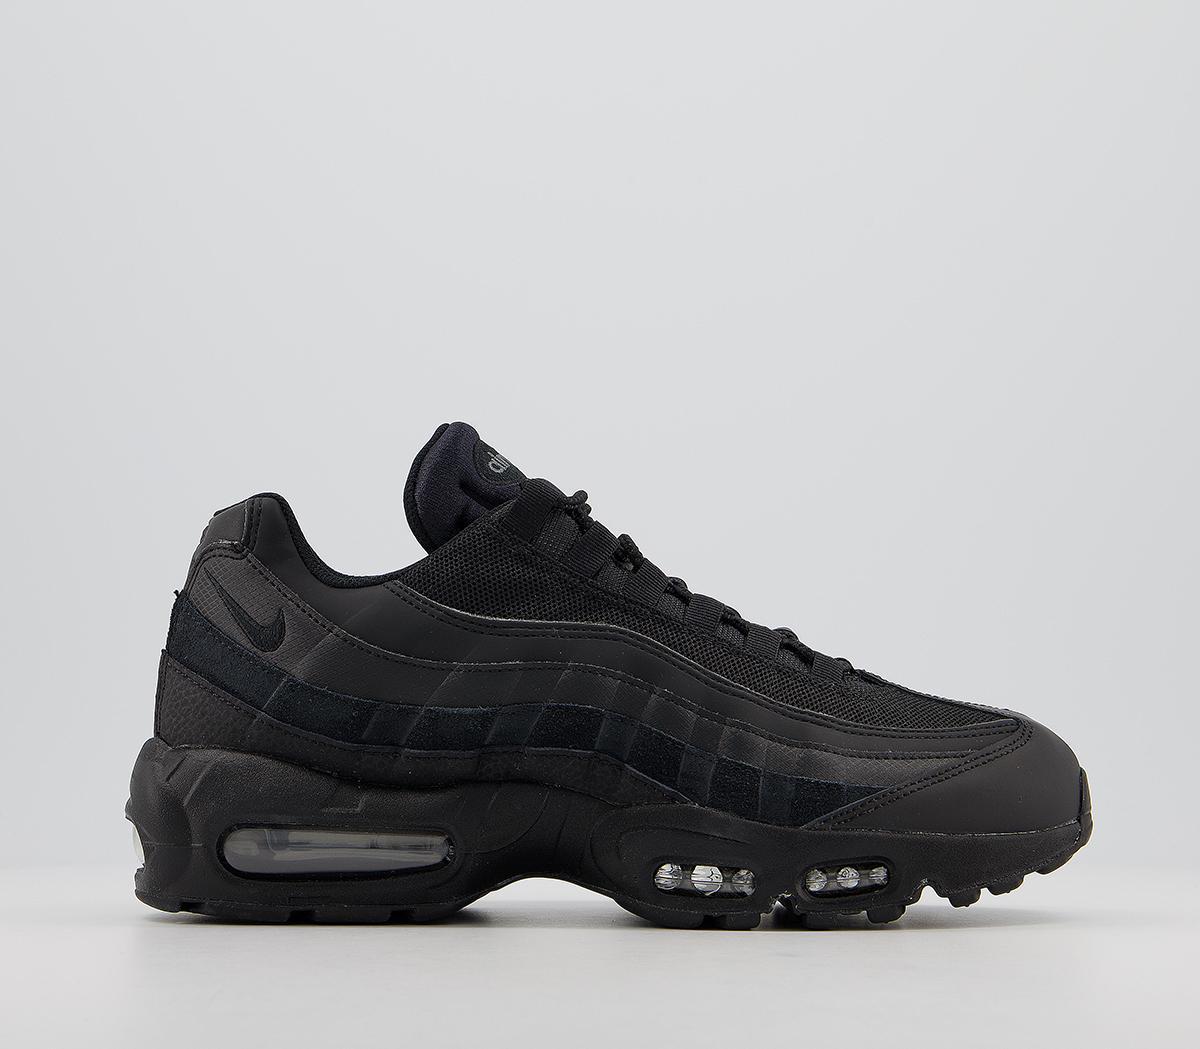 Nike Air Max 95 Trainers Black Black